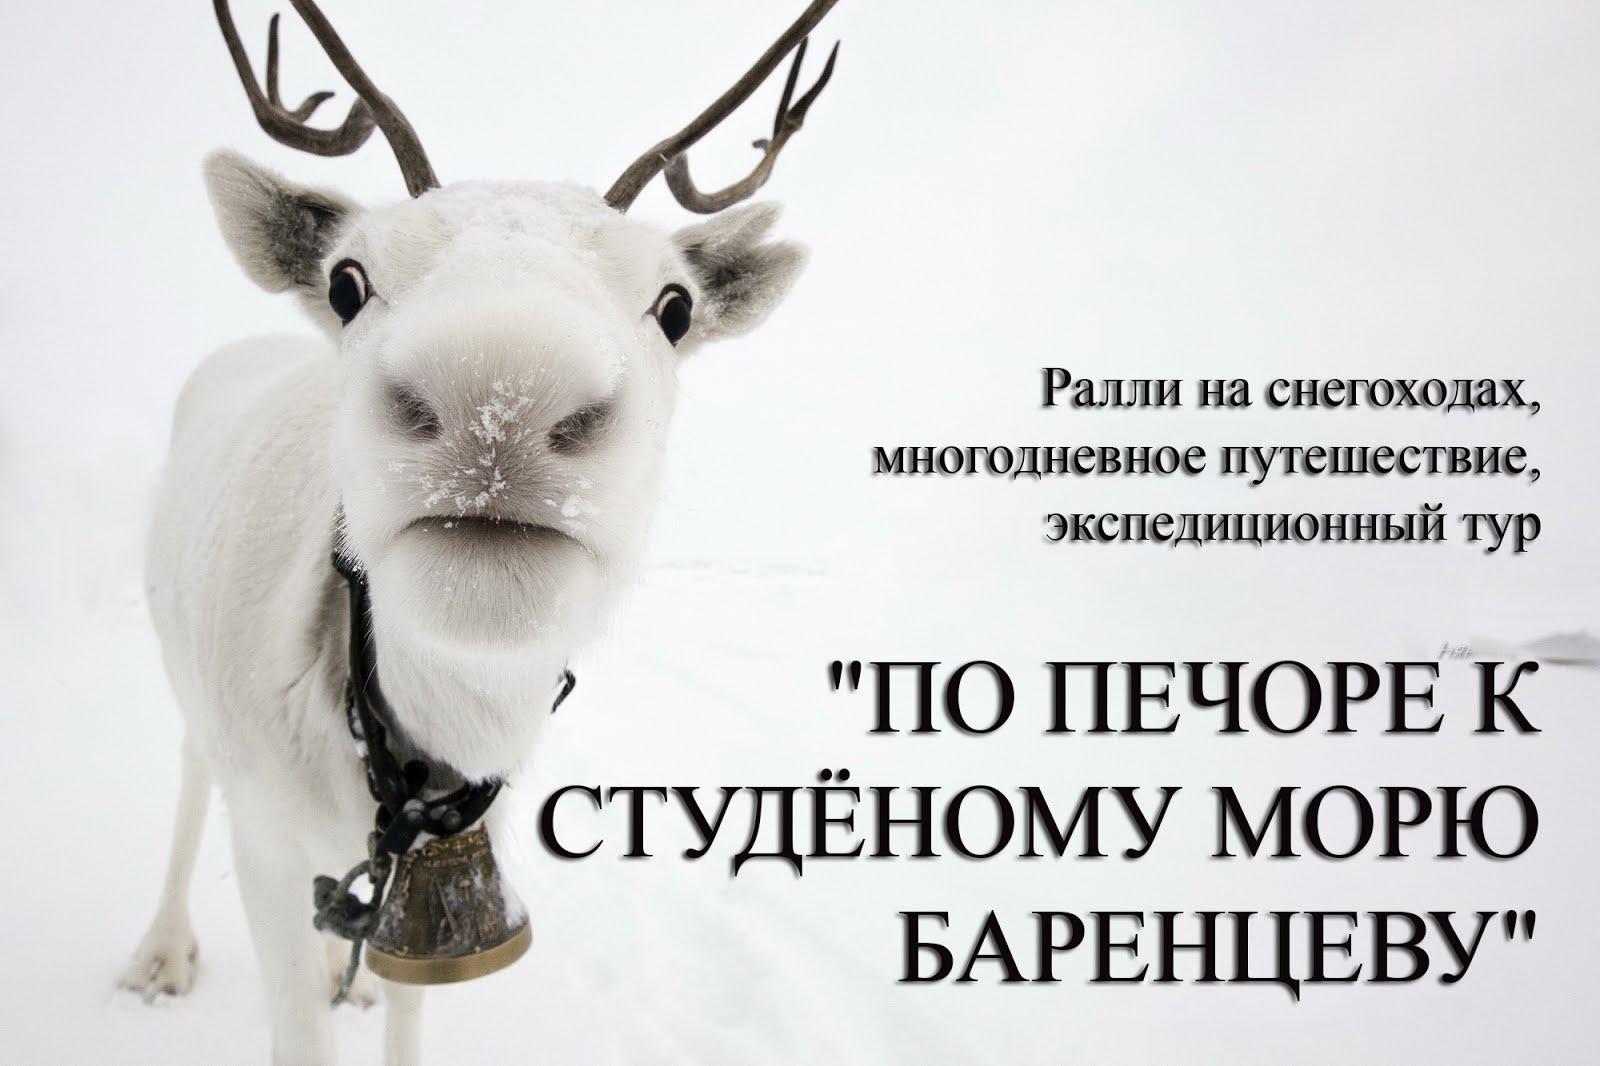 ПО ПЕЧОРЕ К СТУДЁНОМУ МОРЮ БАРЕНЦЕВУ